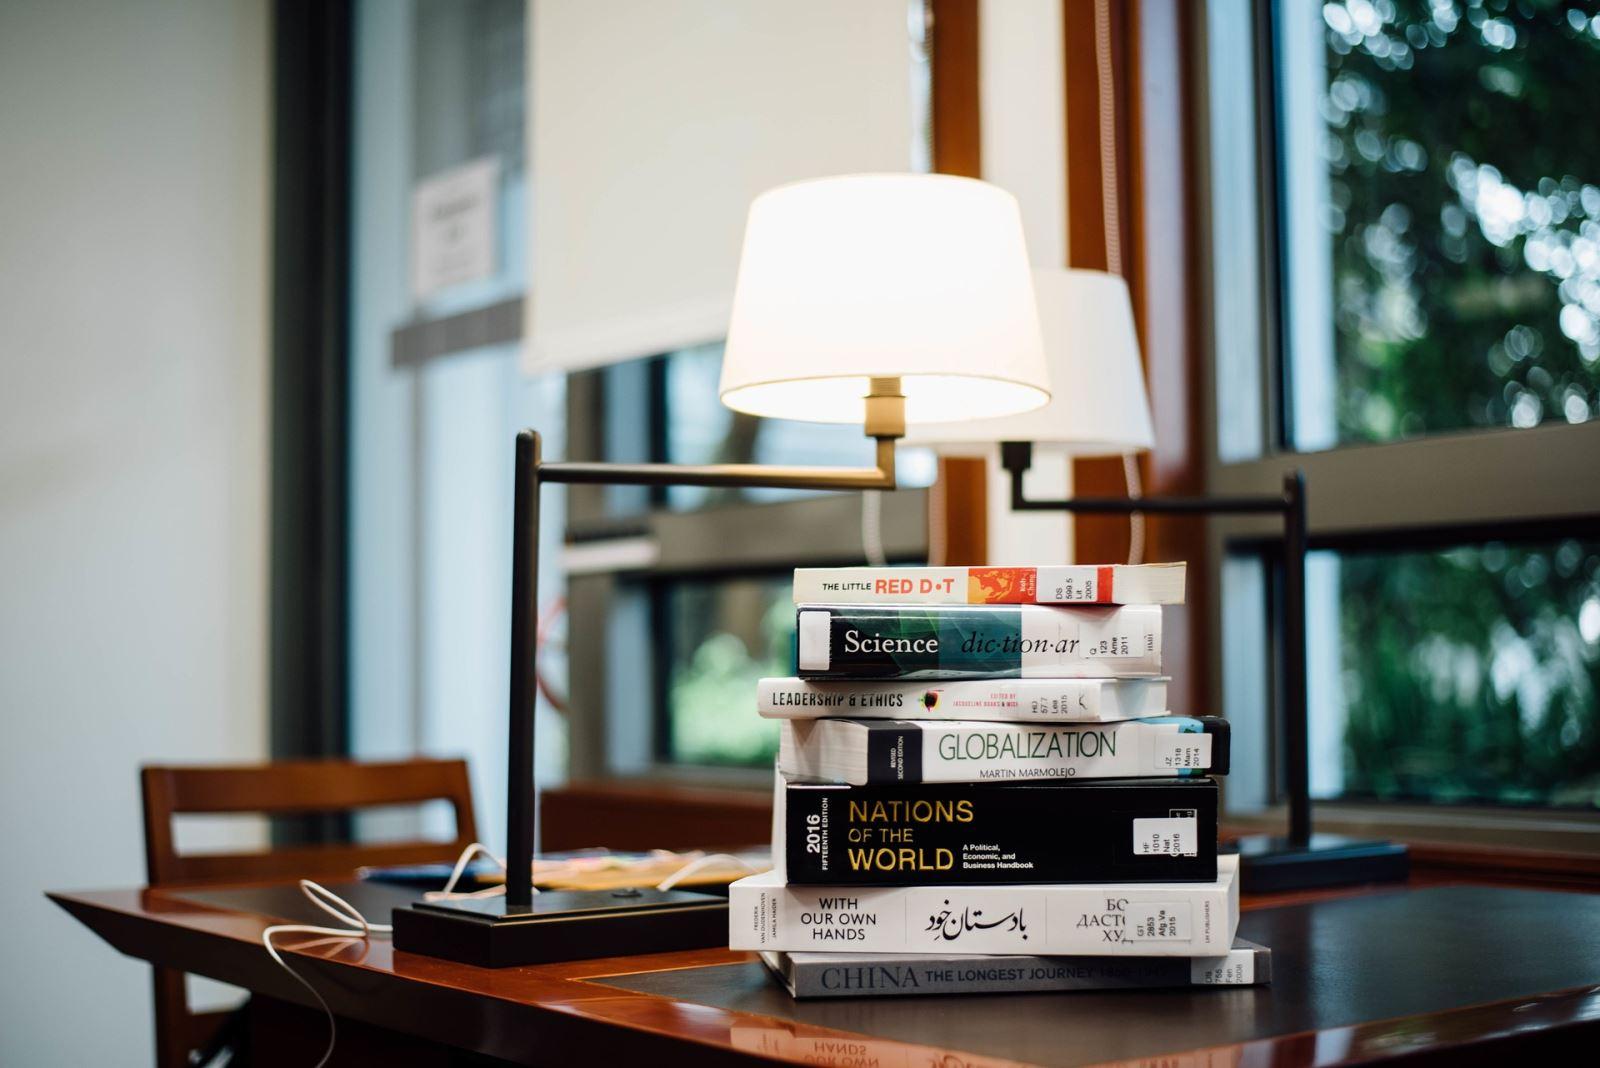 Quale Luce Per Studiare luce calda o fredda per studiare: qual è la più adatta